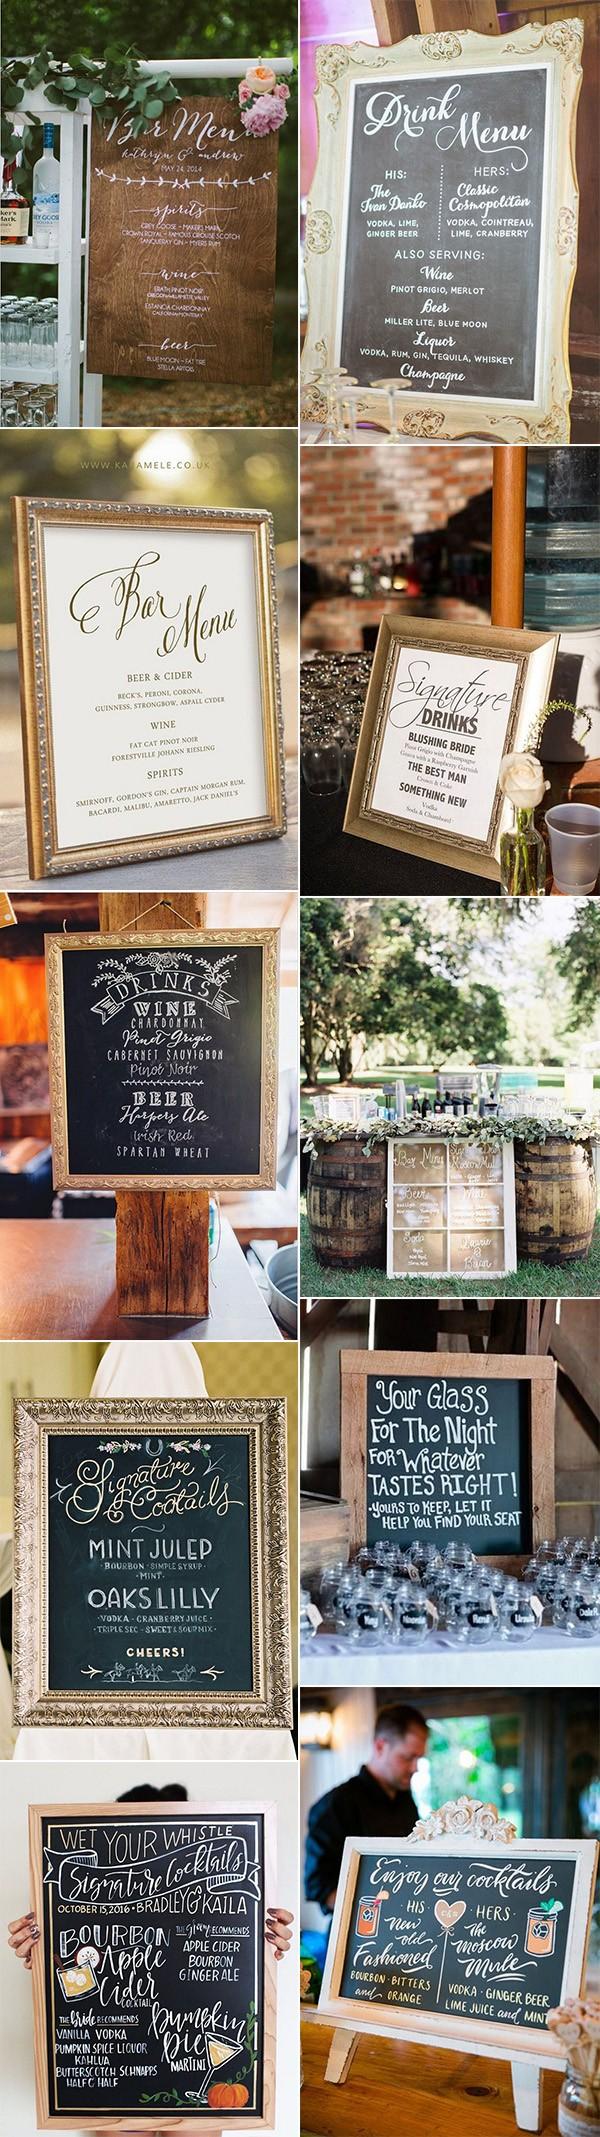 creative wedding drink station signs